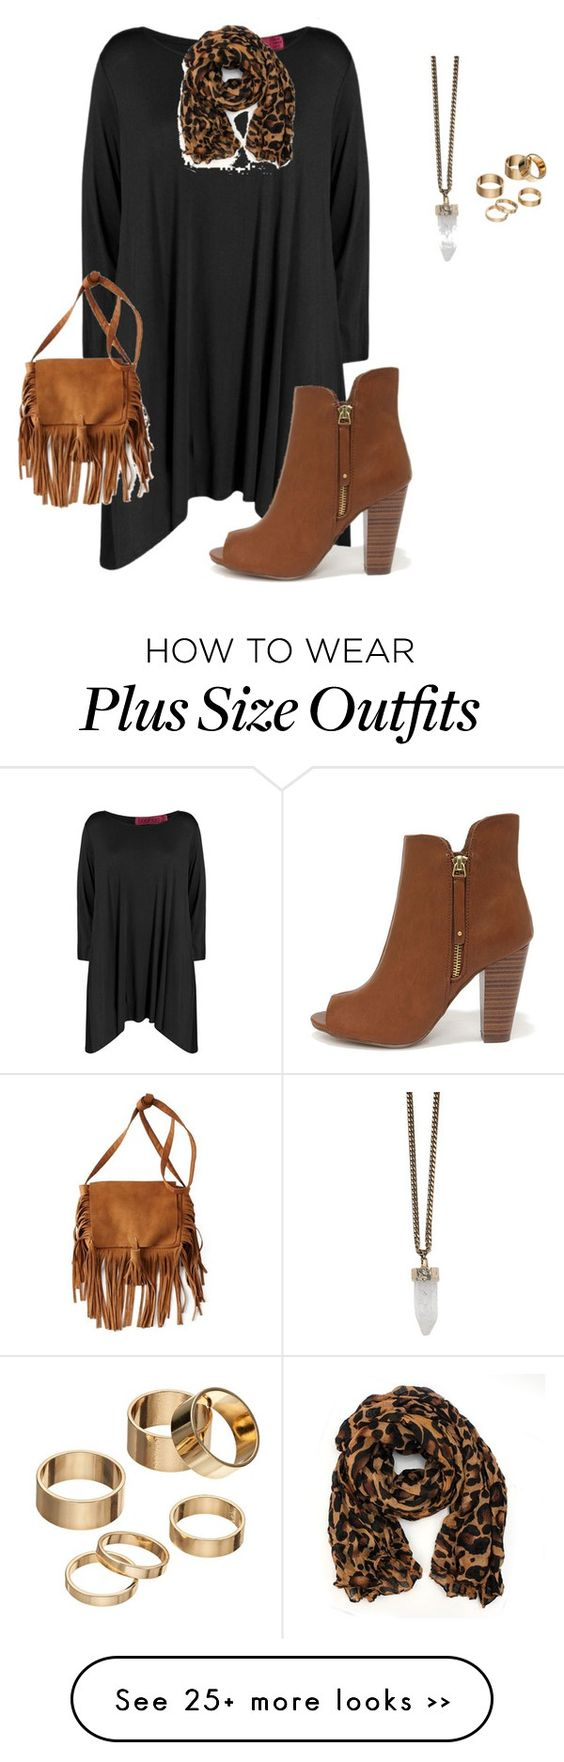 11 plus size short black dresses for fashionable outfits - 11-plus-size-short-black-dresses-for-fashionable-outfits